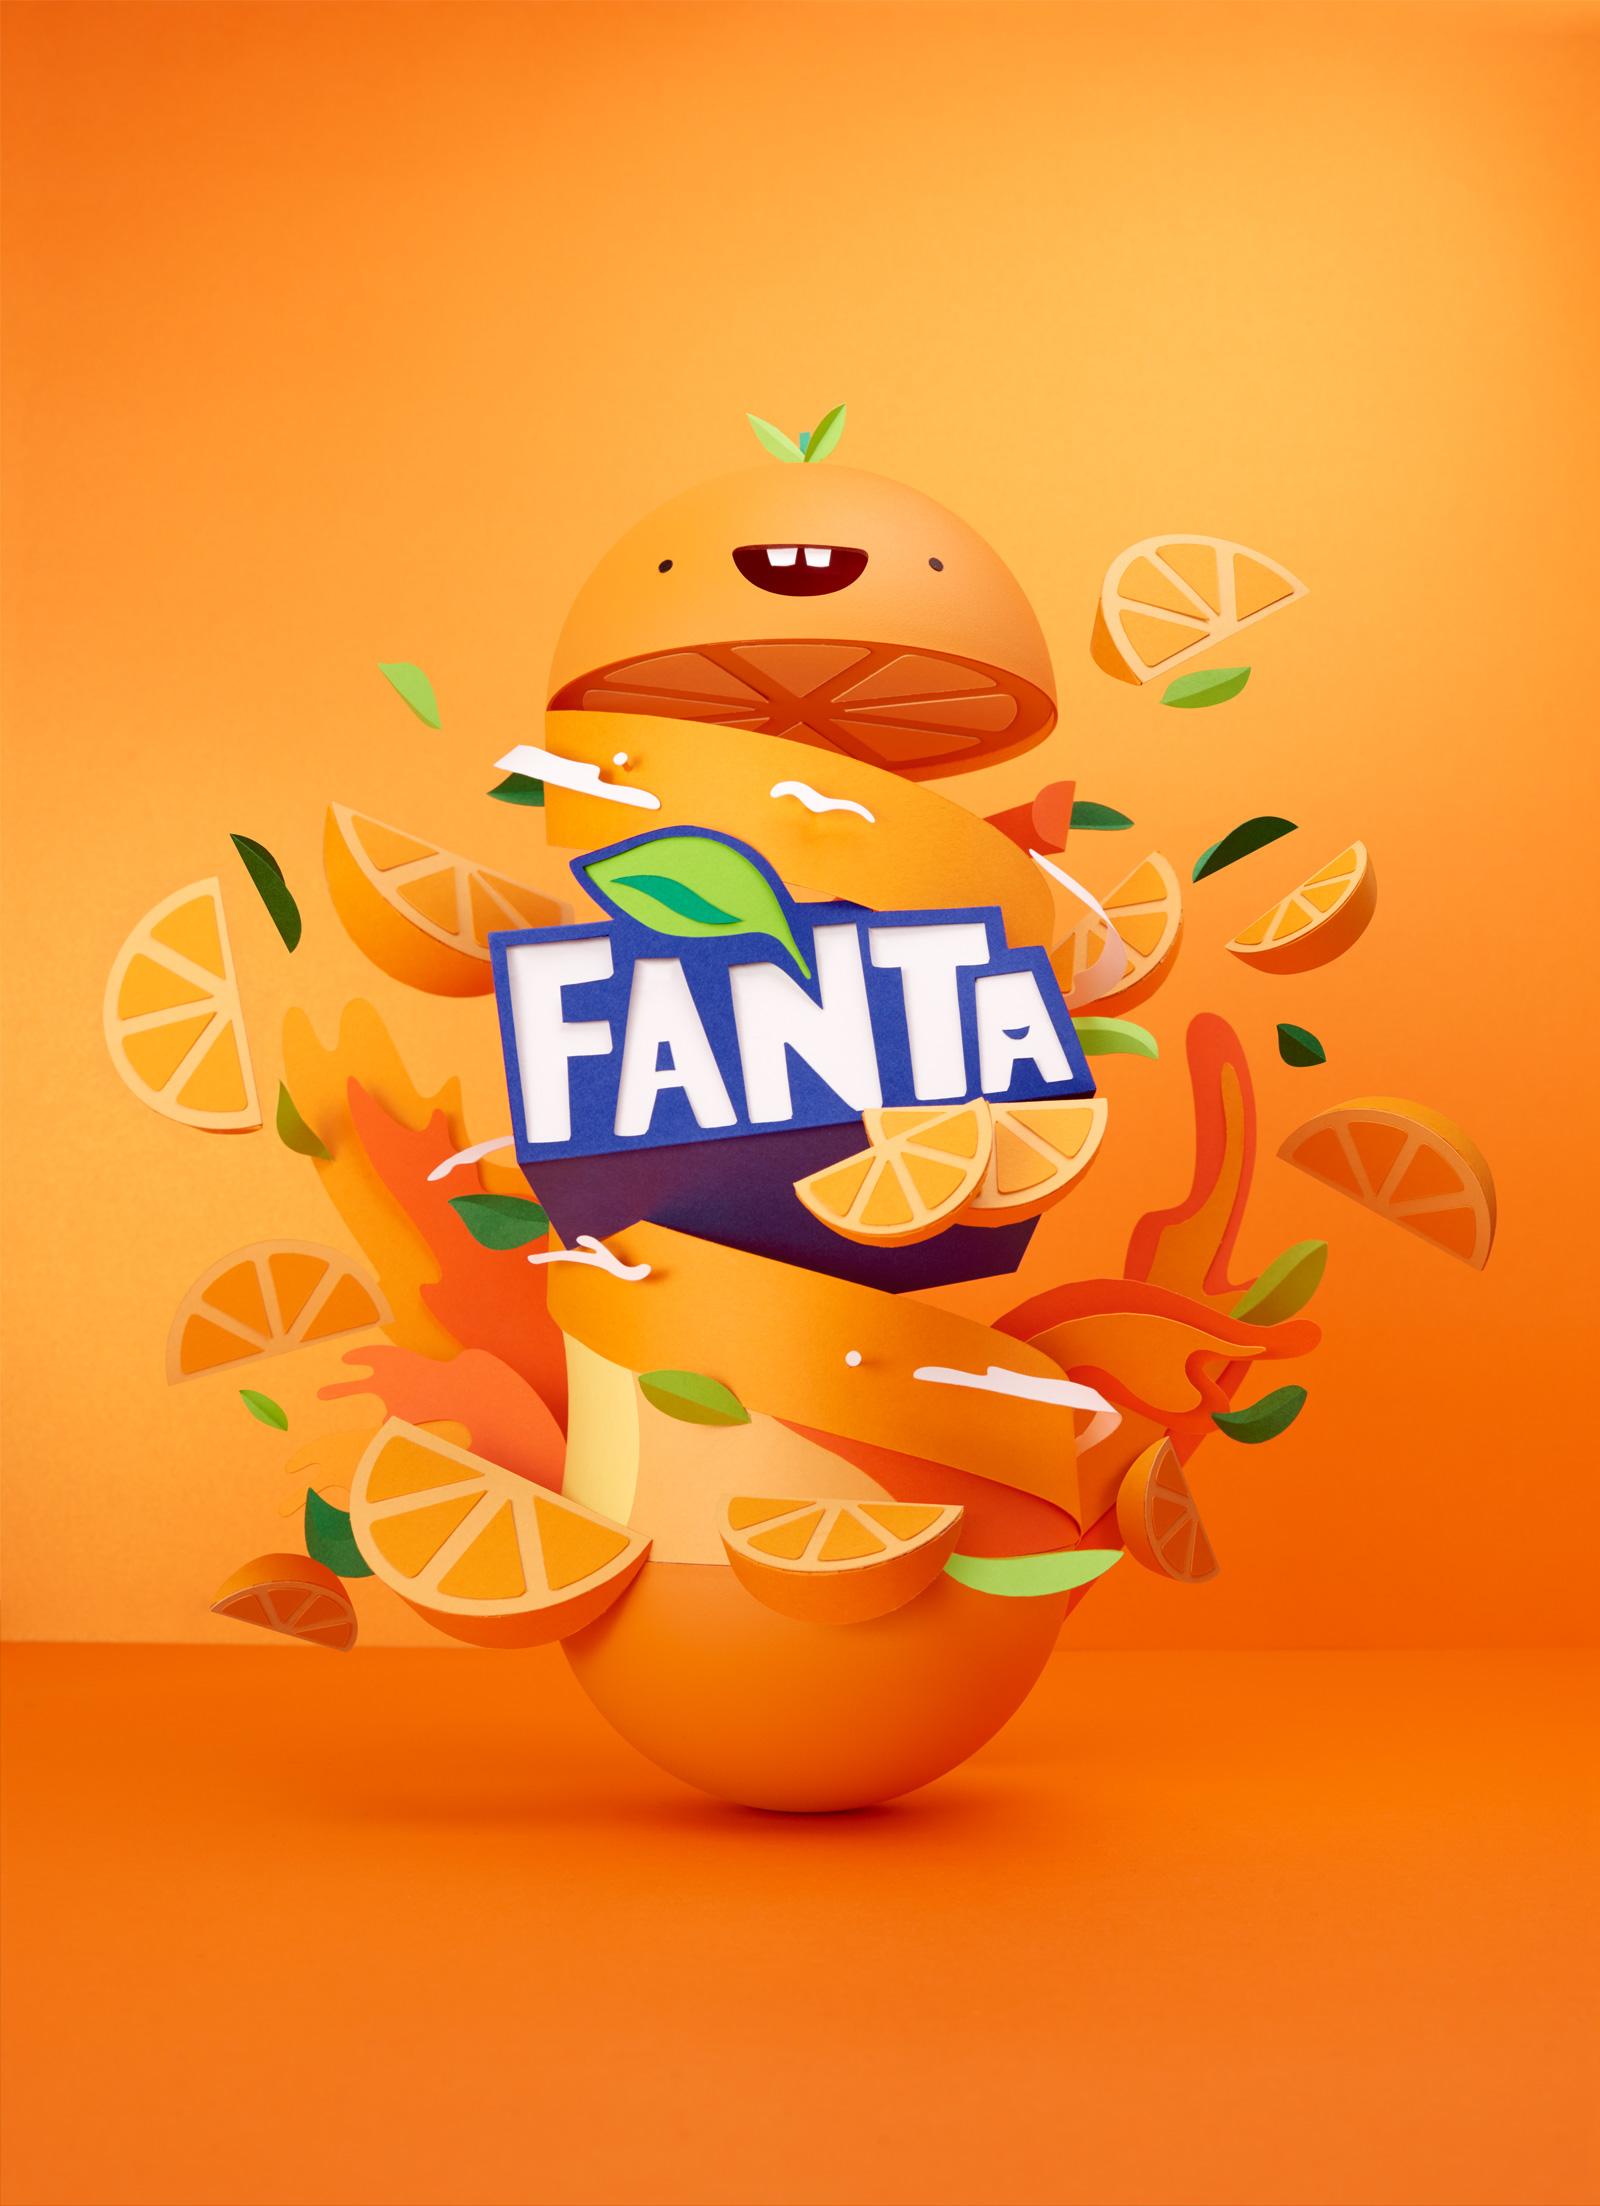 Fanta Poster by Lobulo Studio's - www.lobulostudio.com